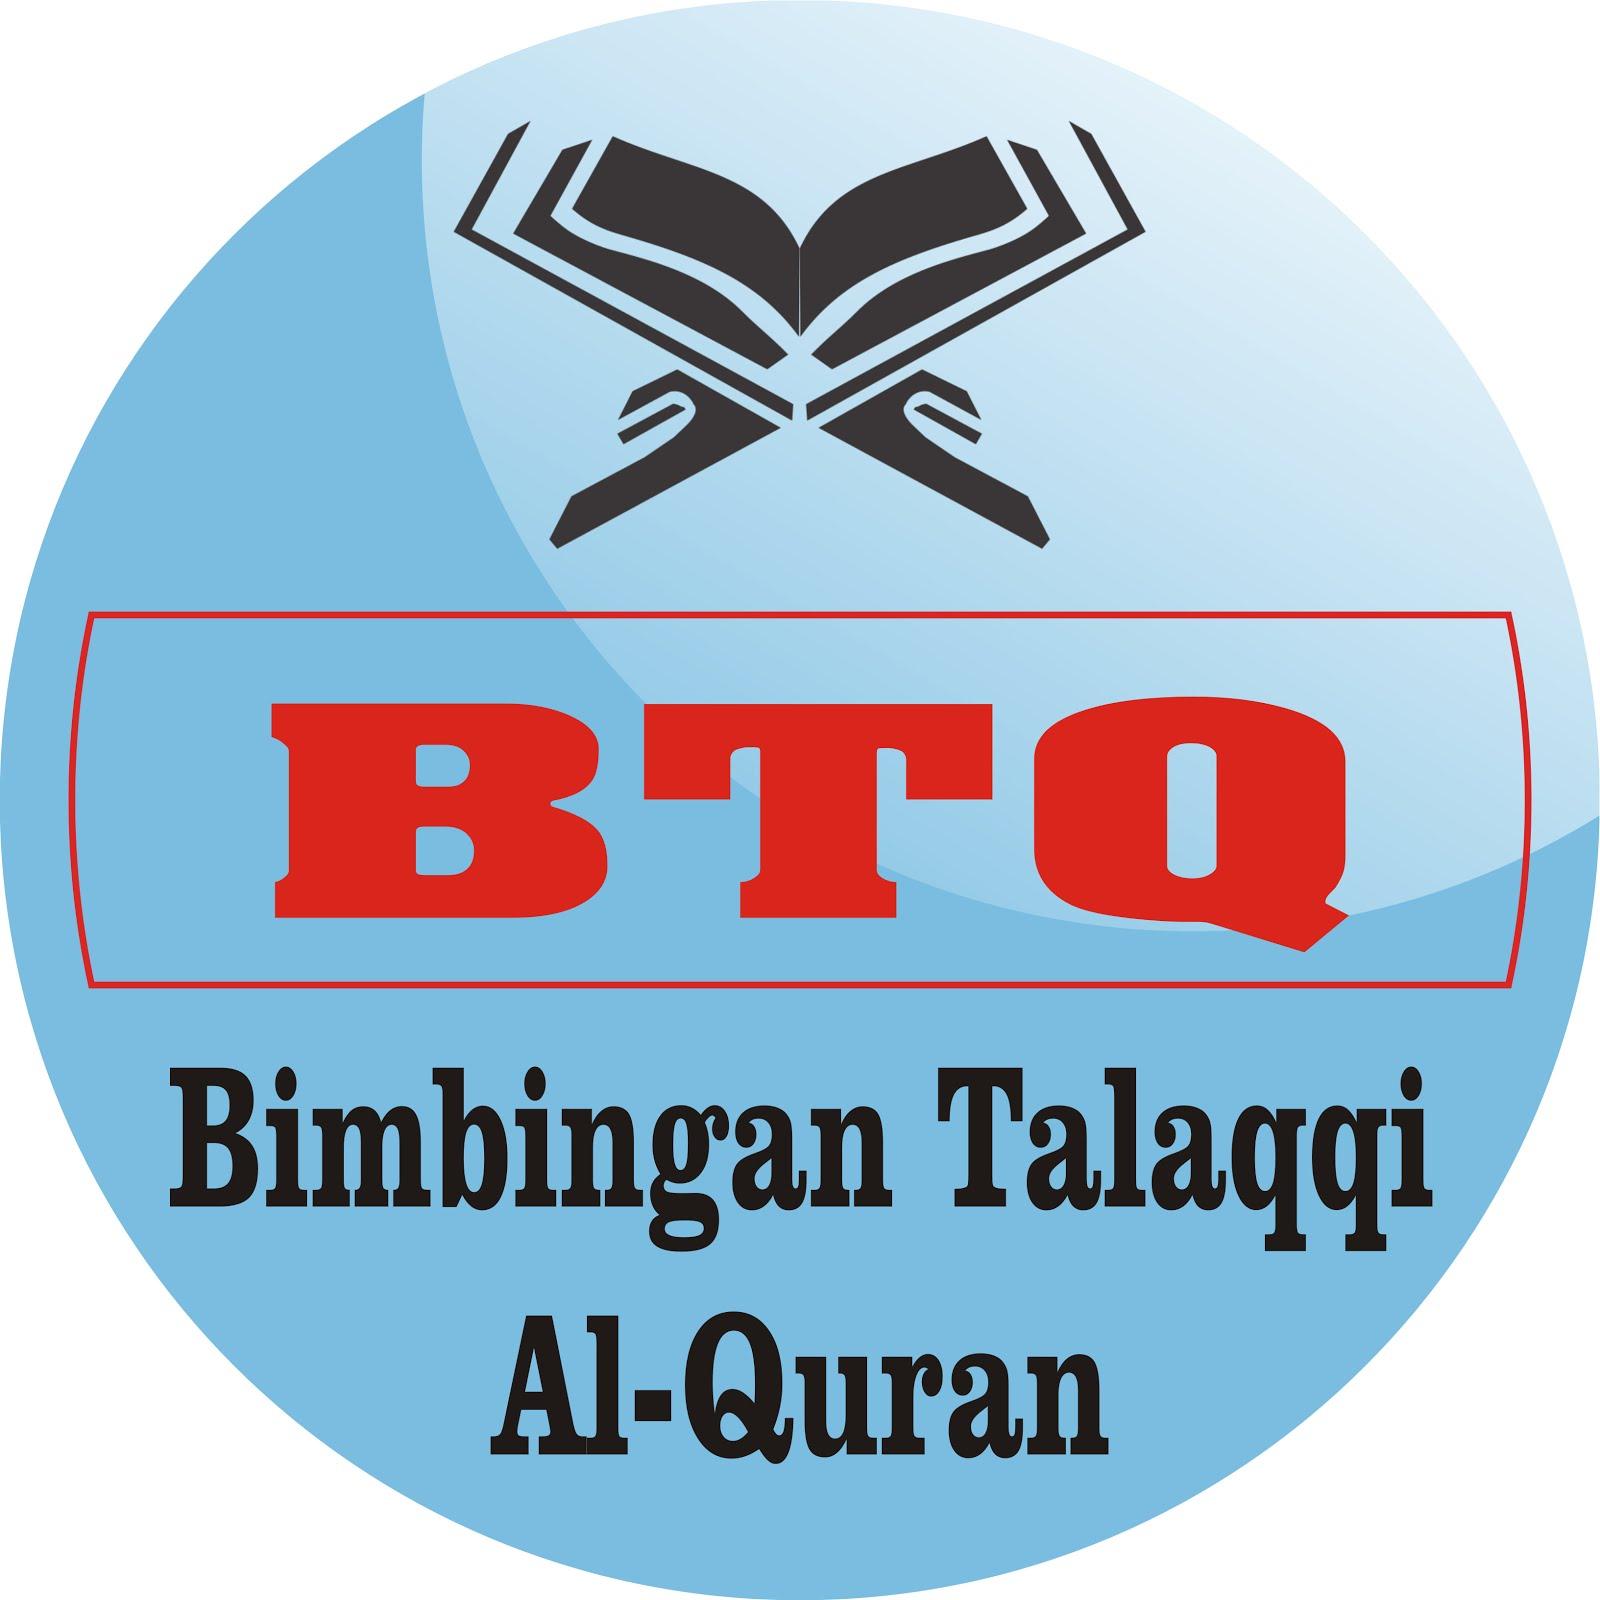 Bimbingan Talaqqi Al Quran